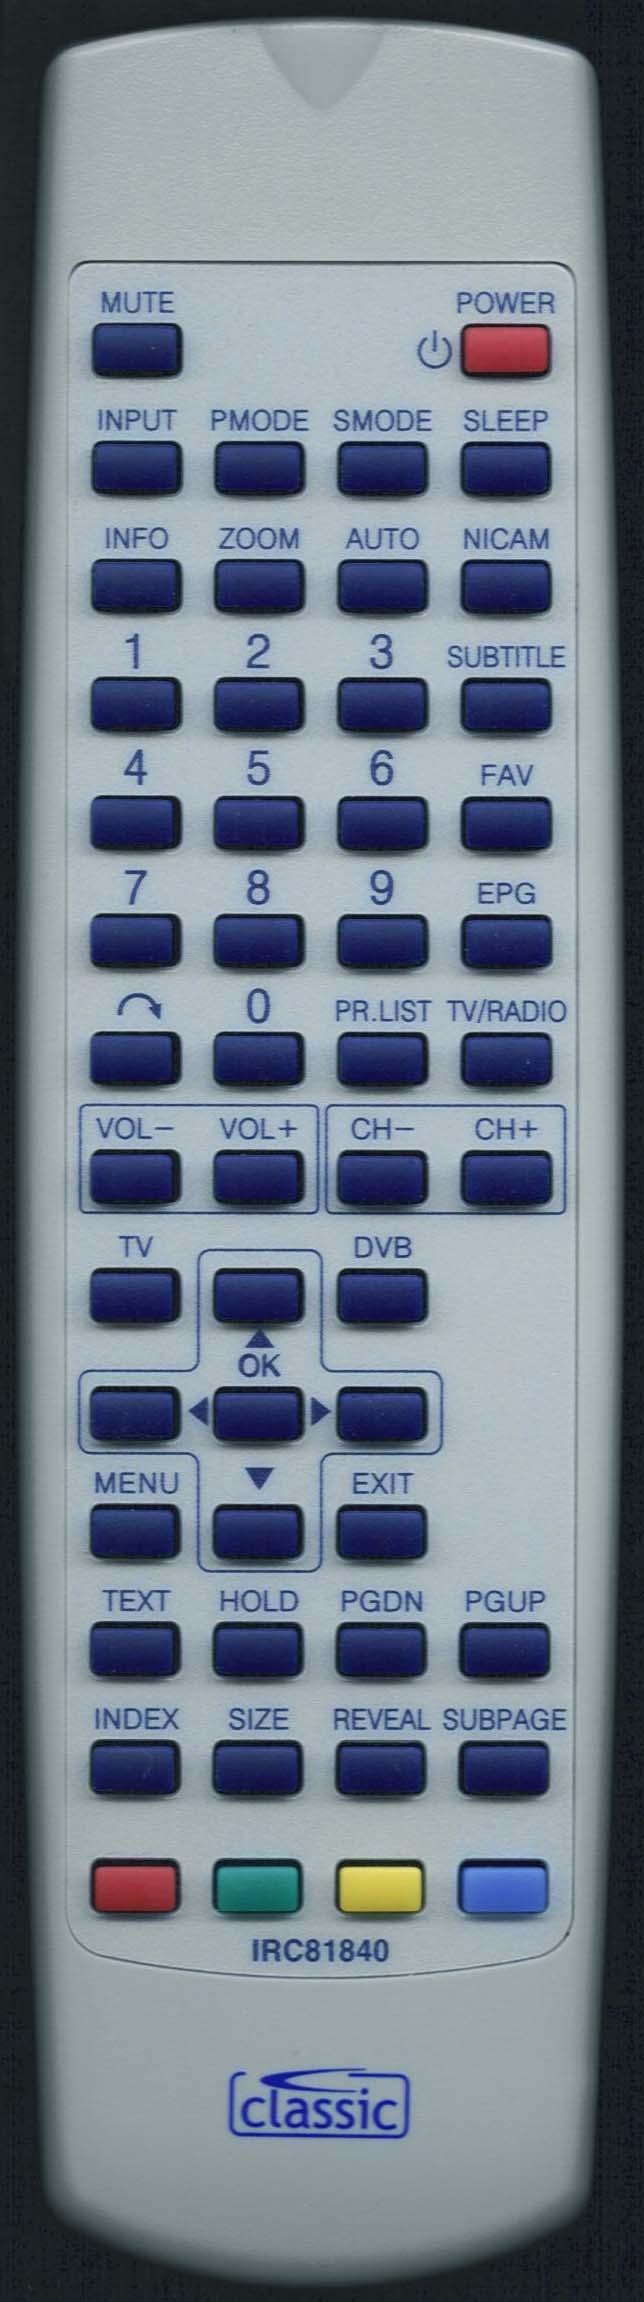 Baird OR42BAFHD Remote Control